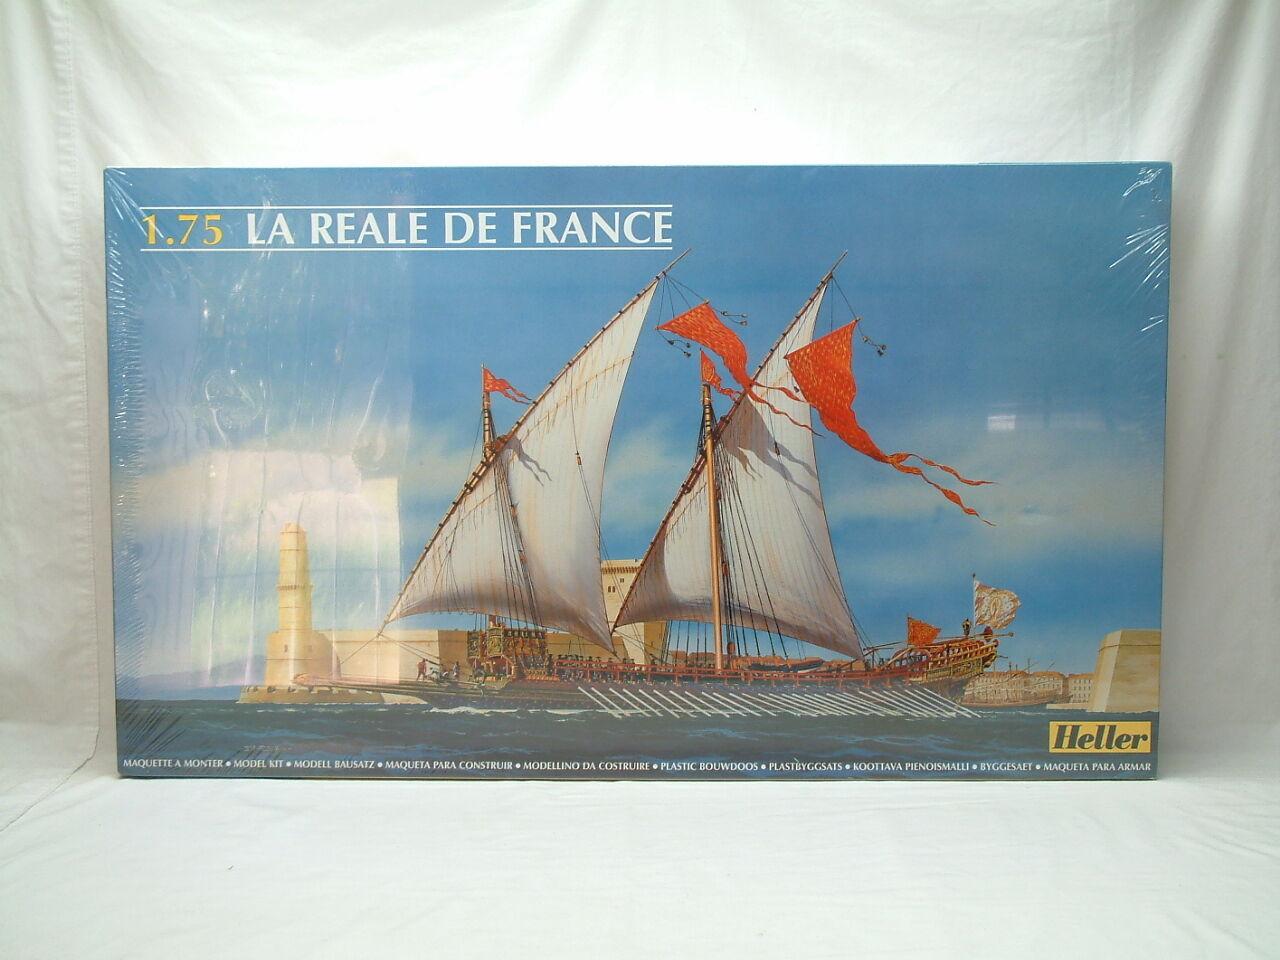 Sello del velero real francés Heller - ratio = 1   75